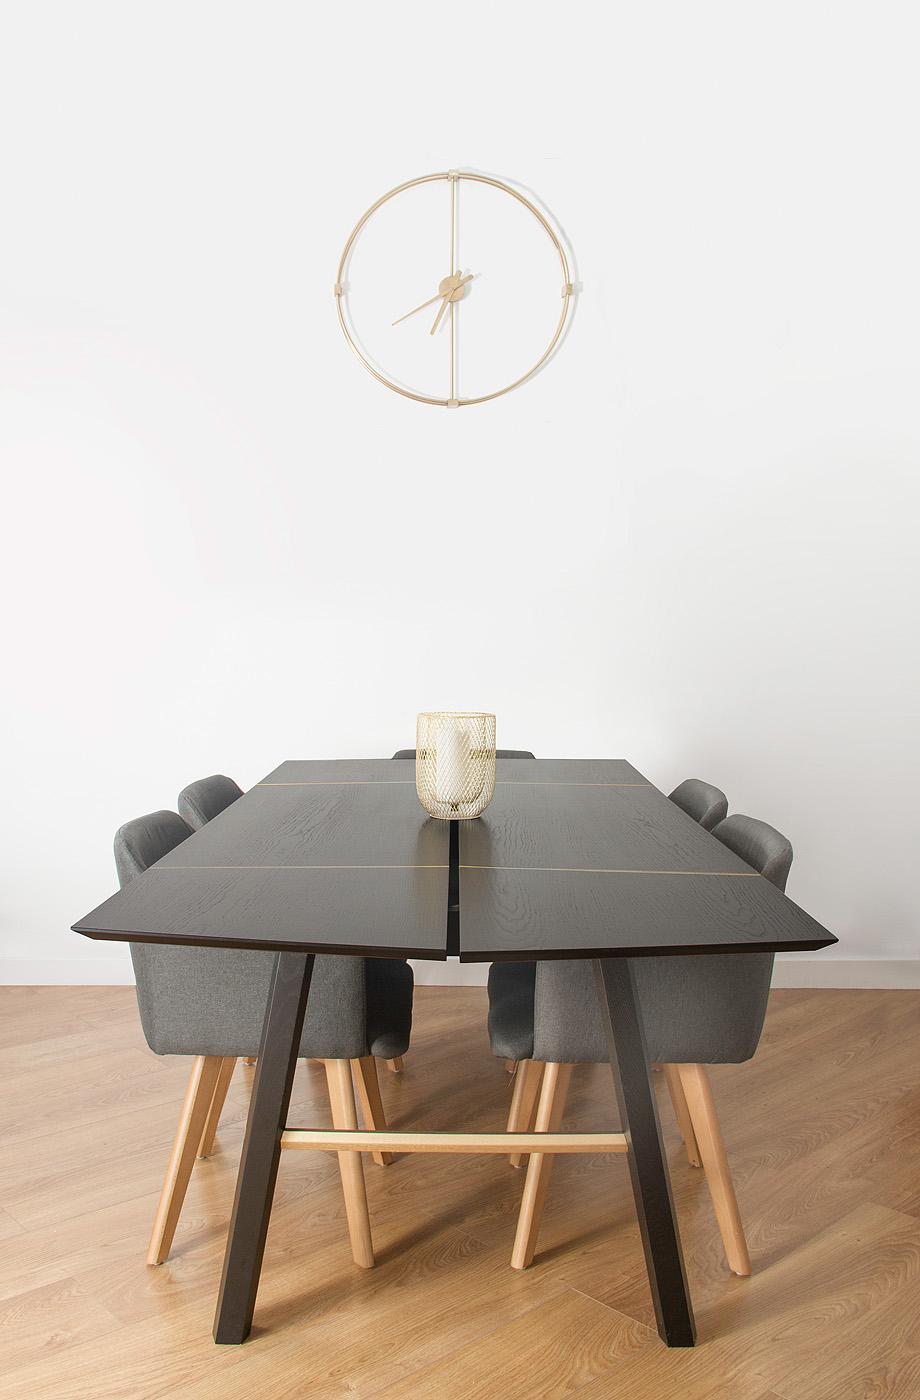 mesa savia de daniel garcia para woodendot (8)